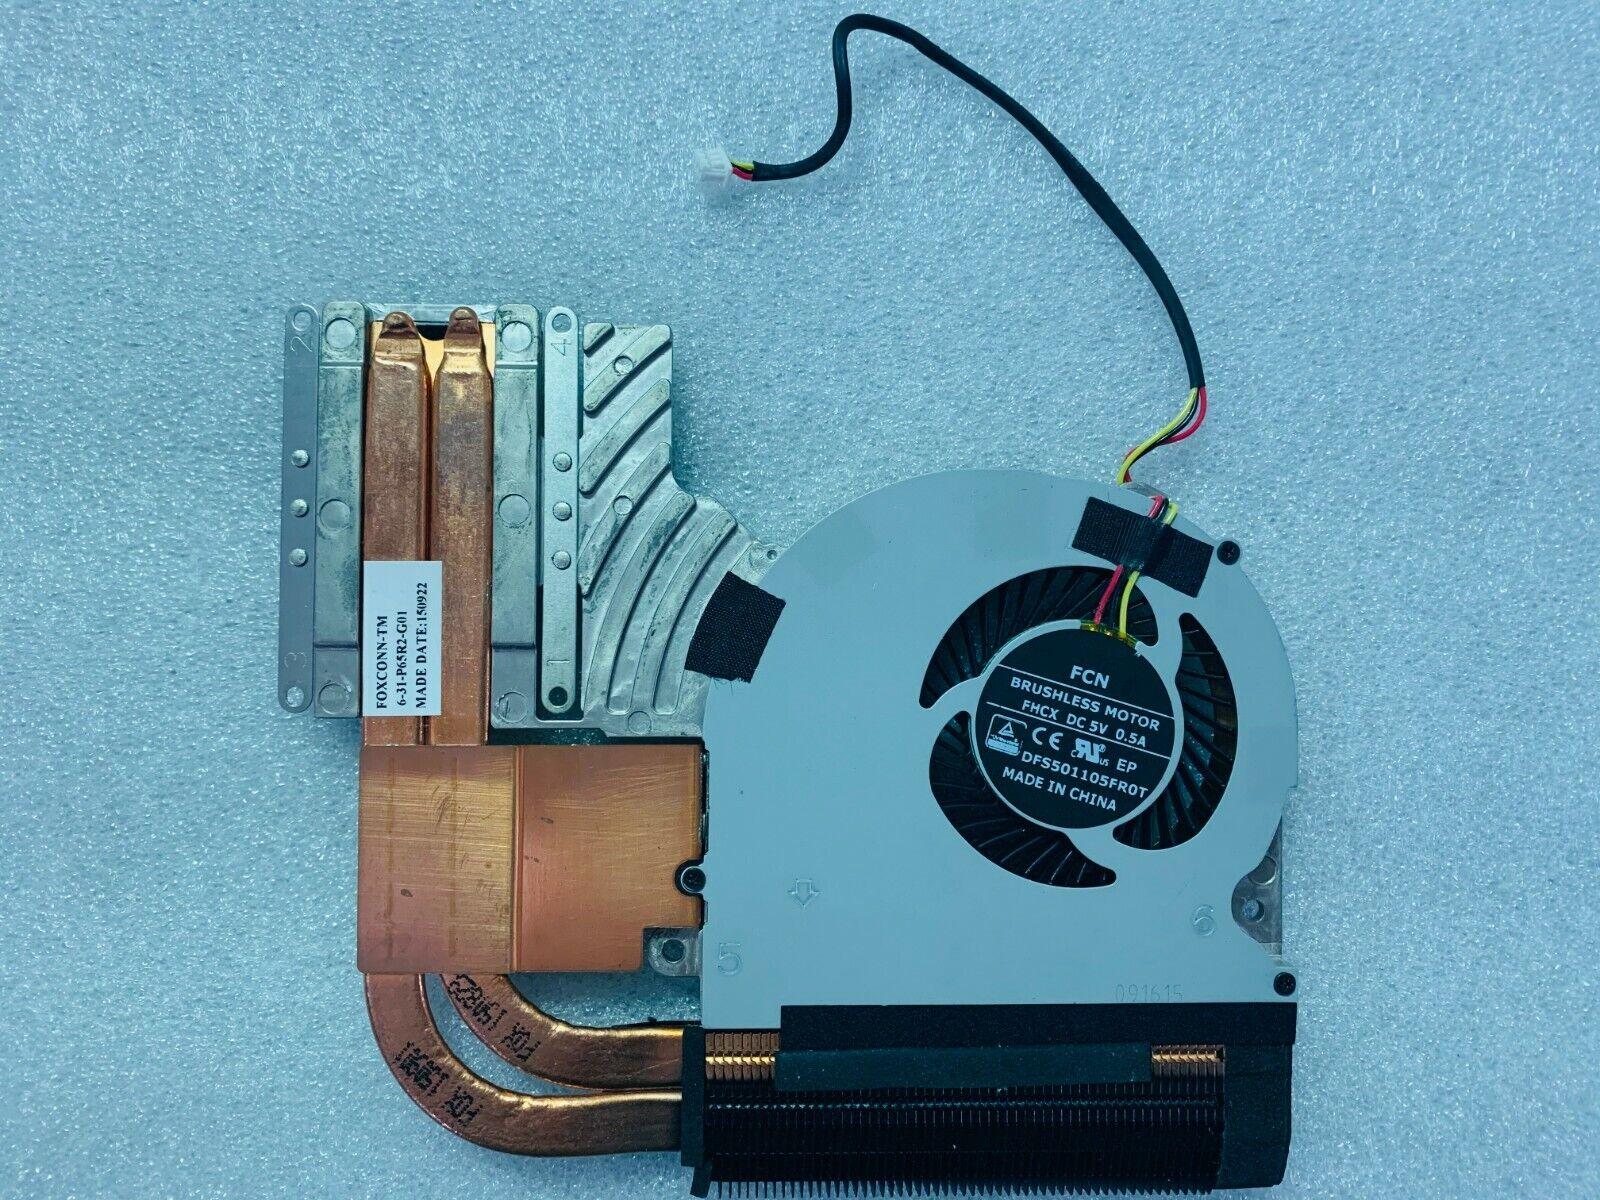 NEW ORIGINAL Clevo 670 CPU FAN w/ Heatsink